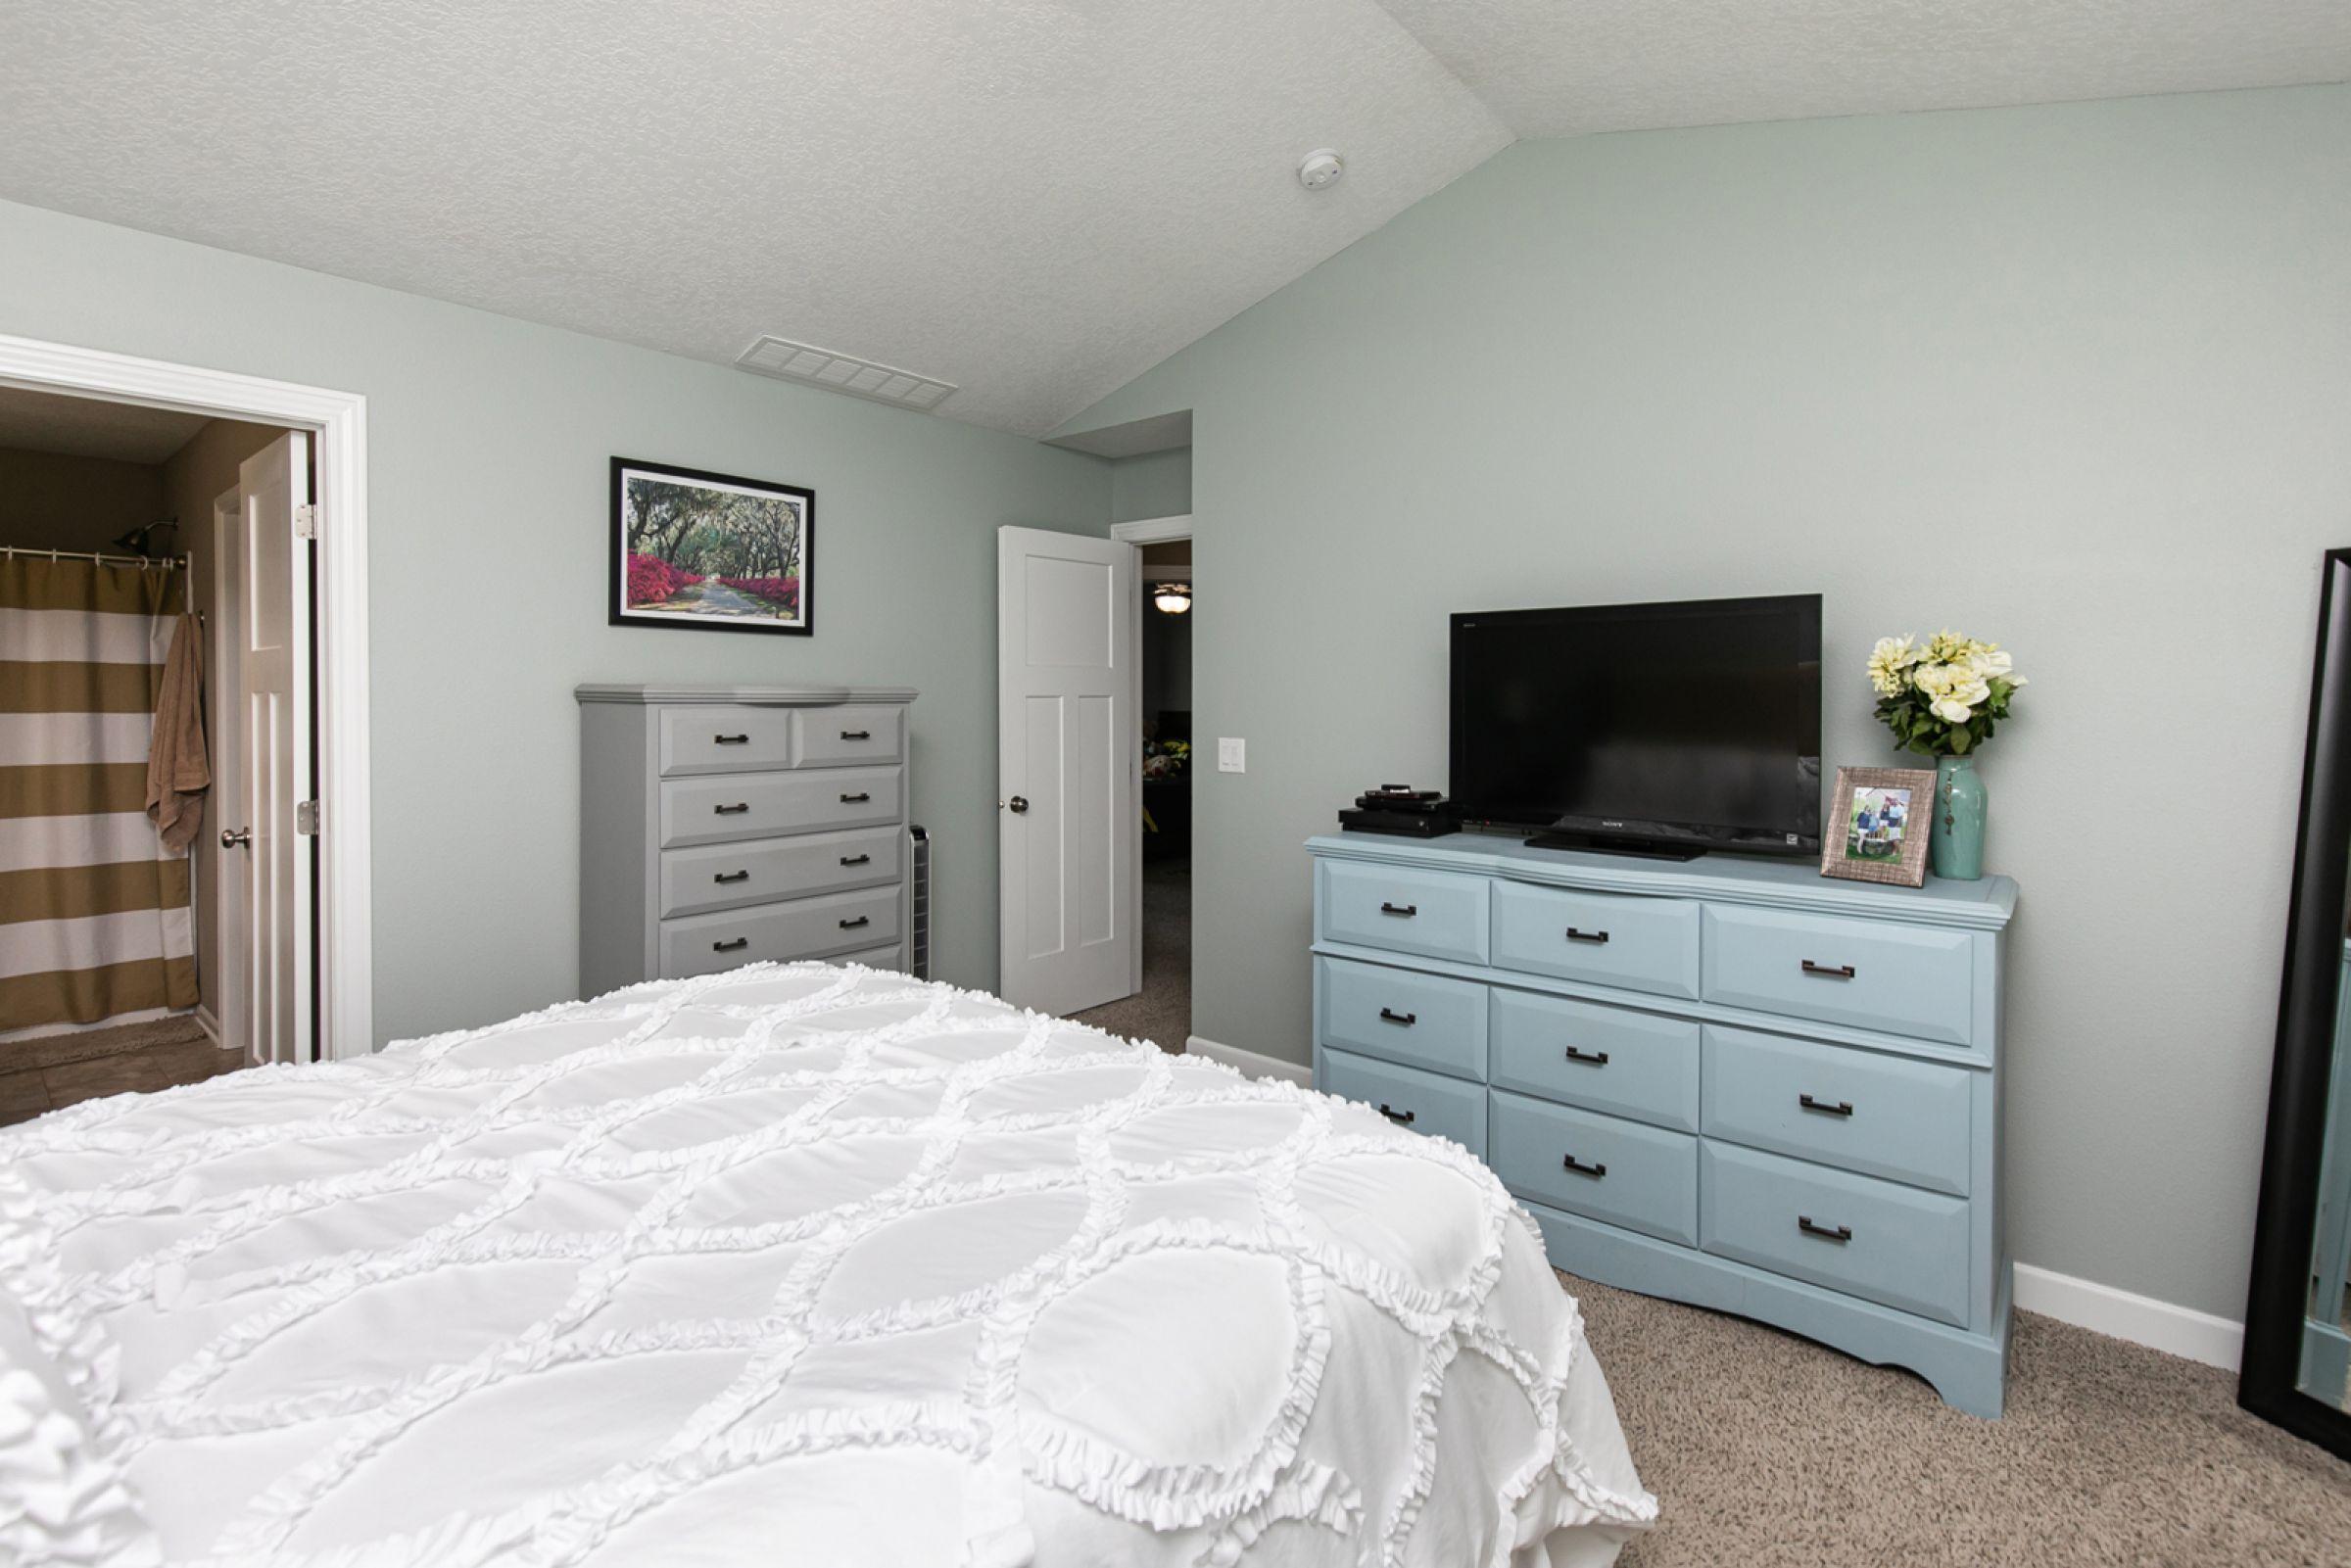 residential-warren-county-iowa-0-acres-listing-number-15685-6-2021-08-31-032419.jpg